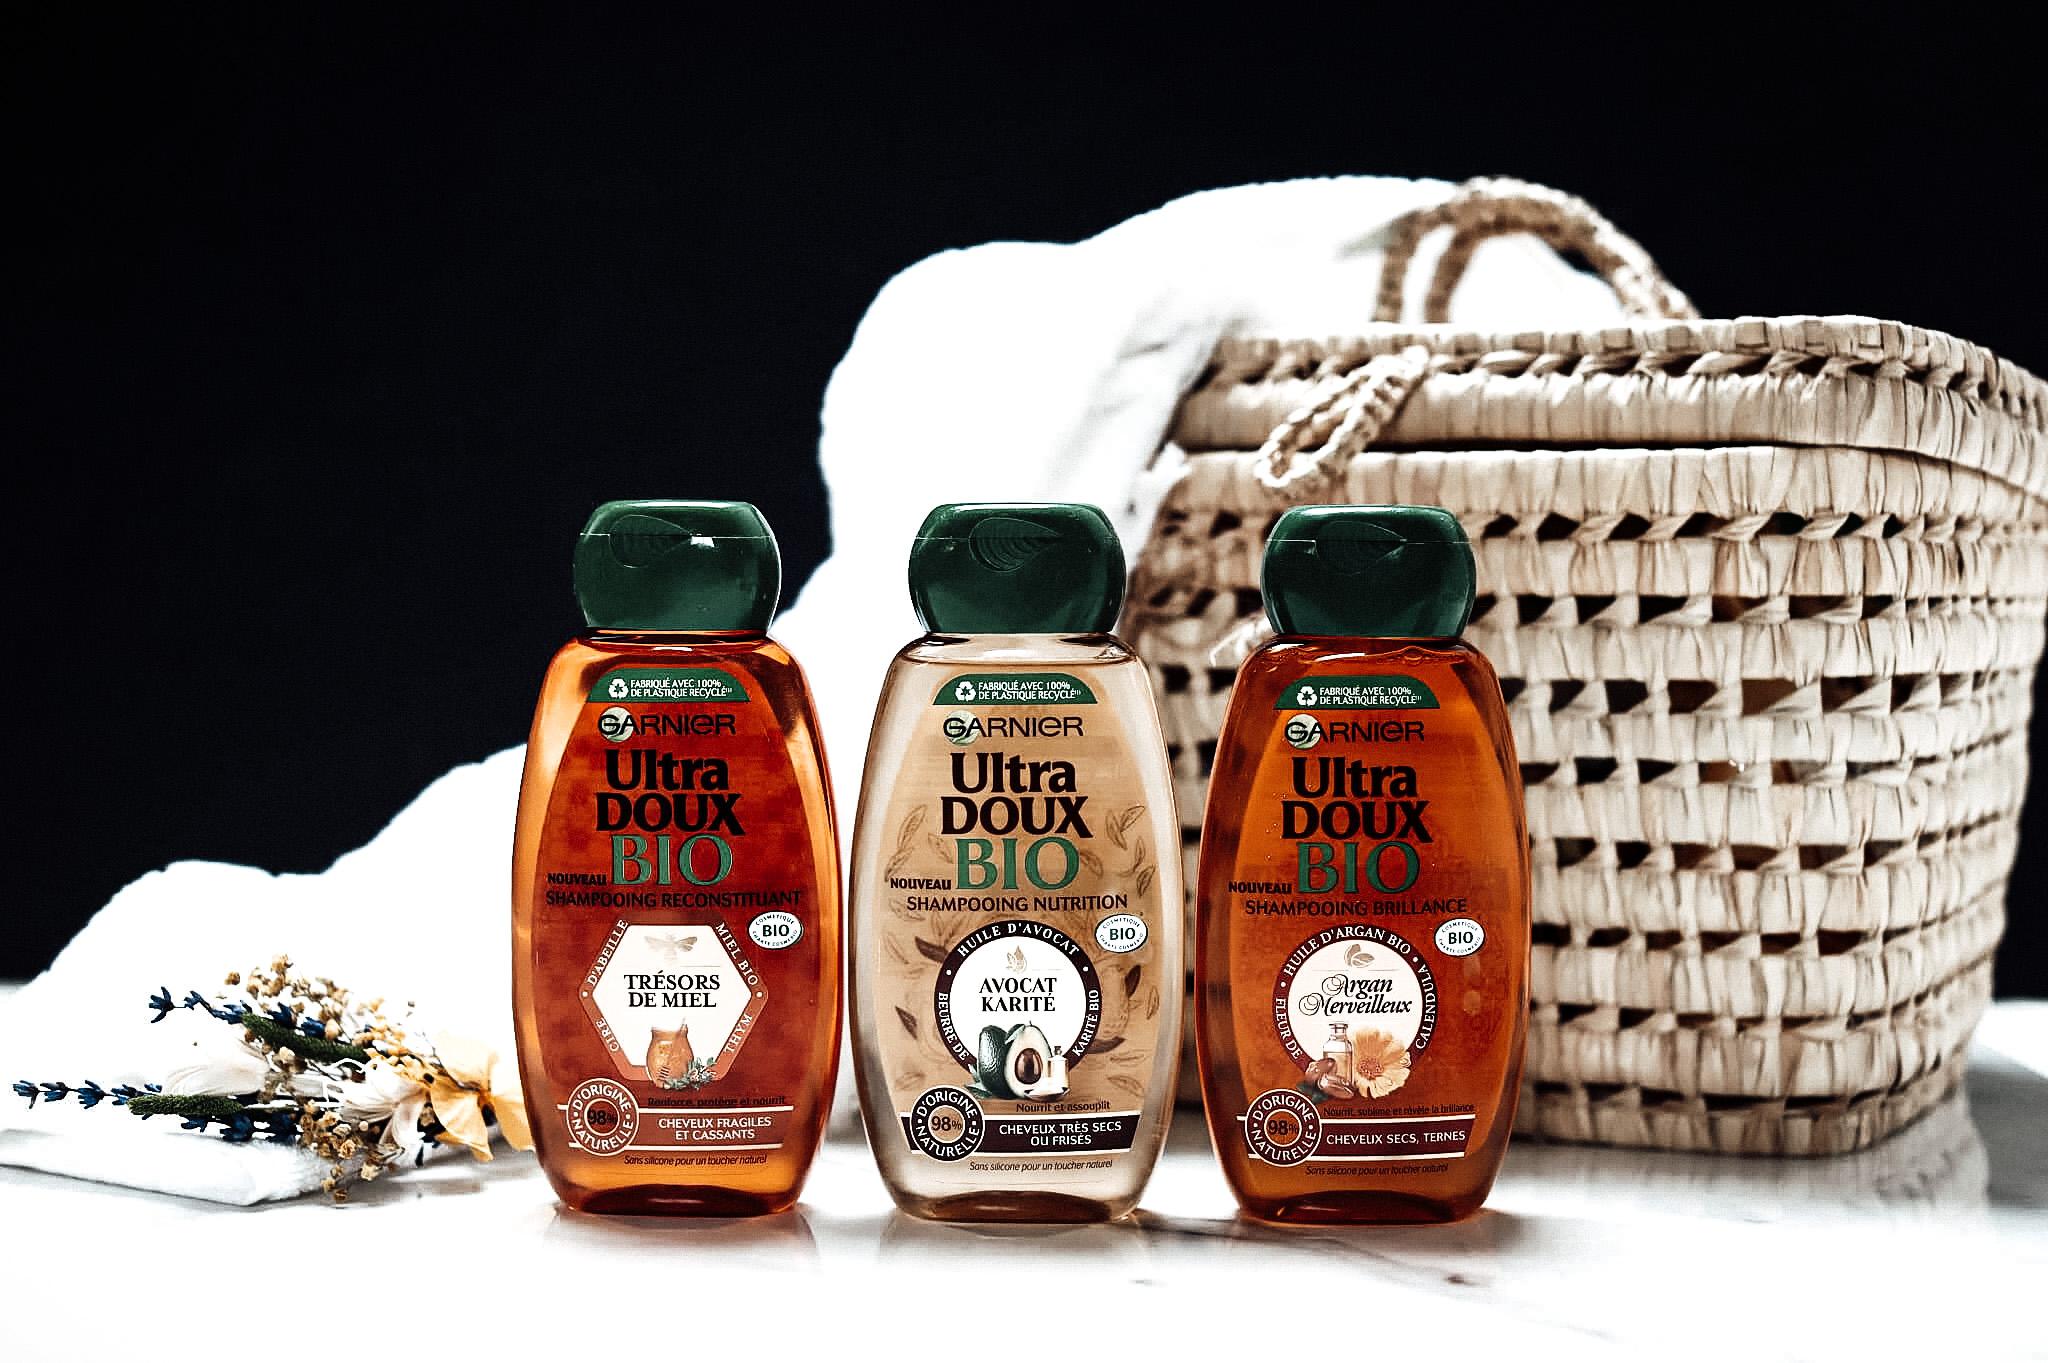 Garnier Bio Ultra Doux Shampooing